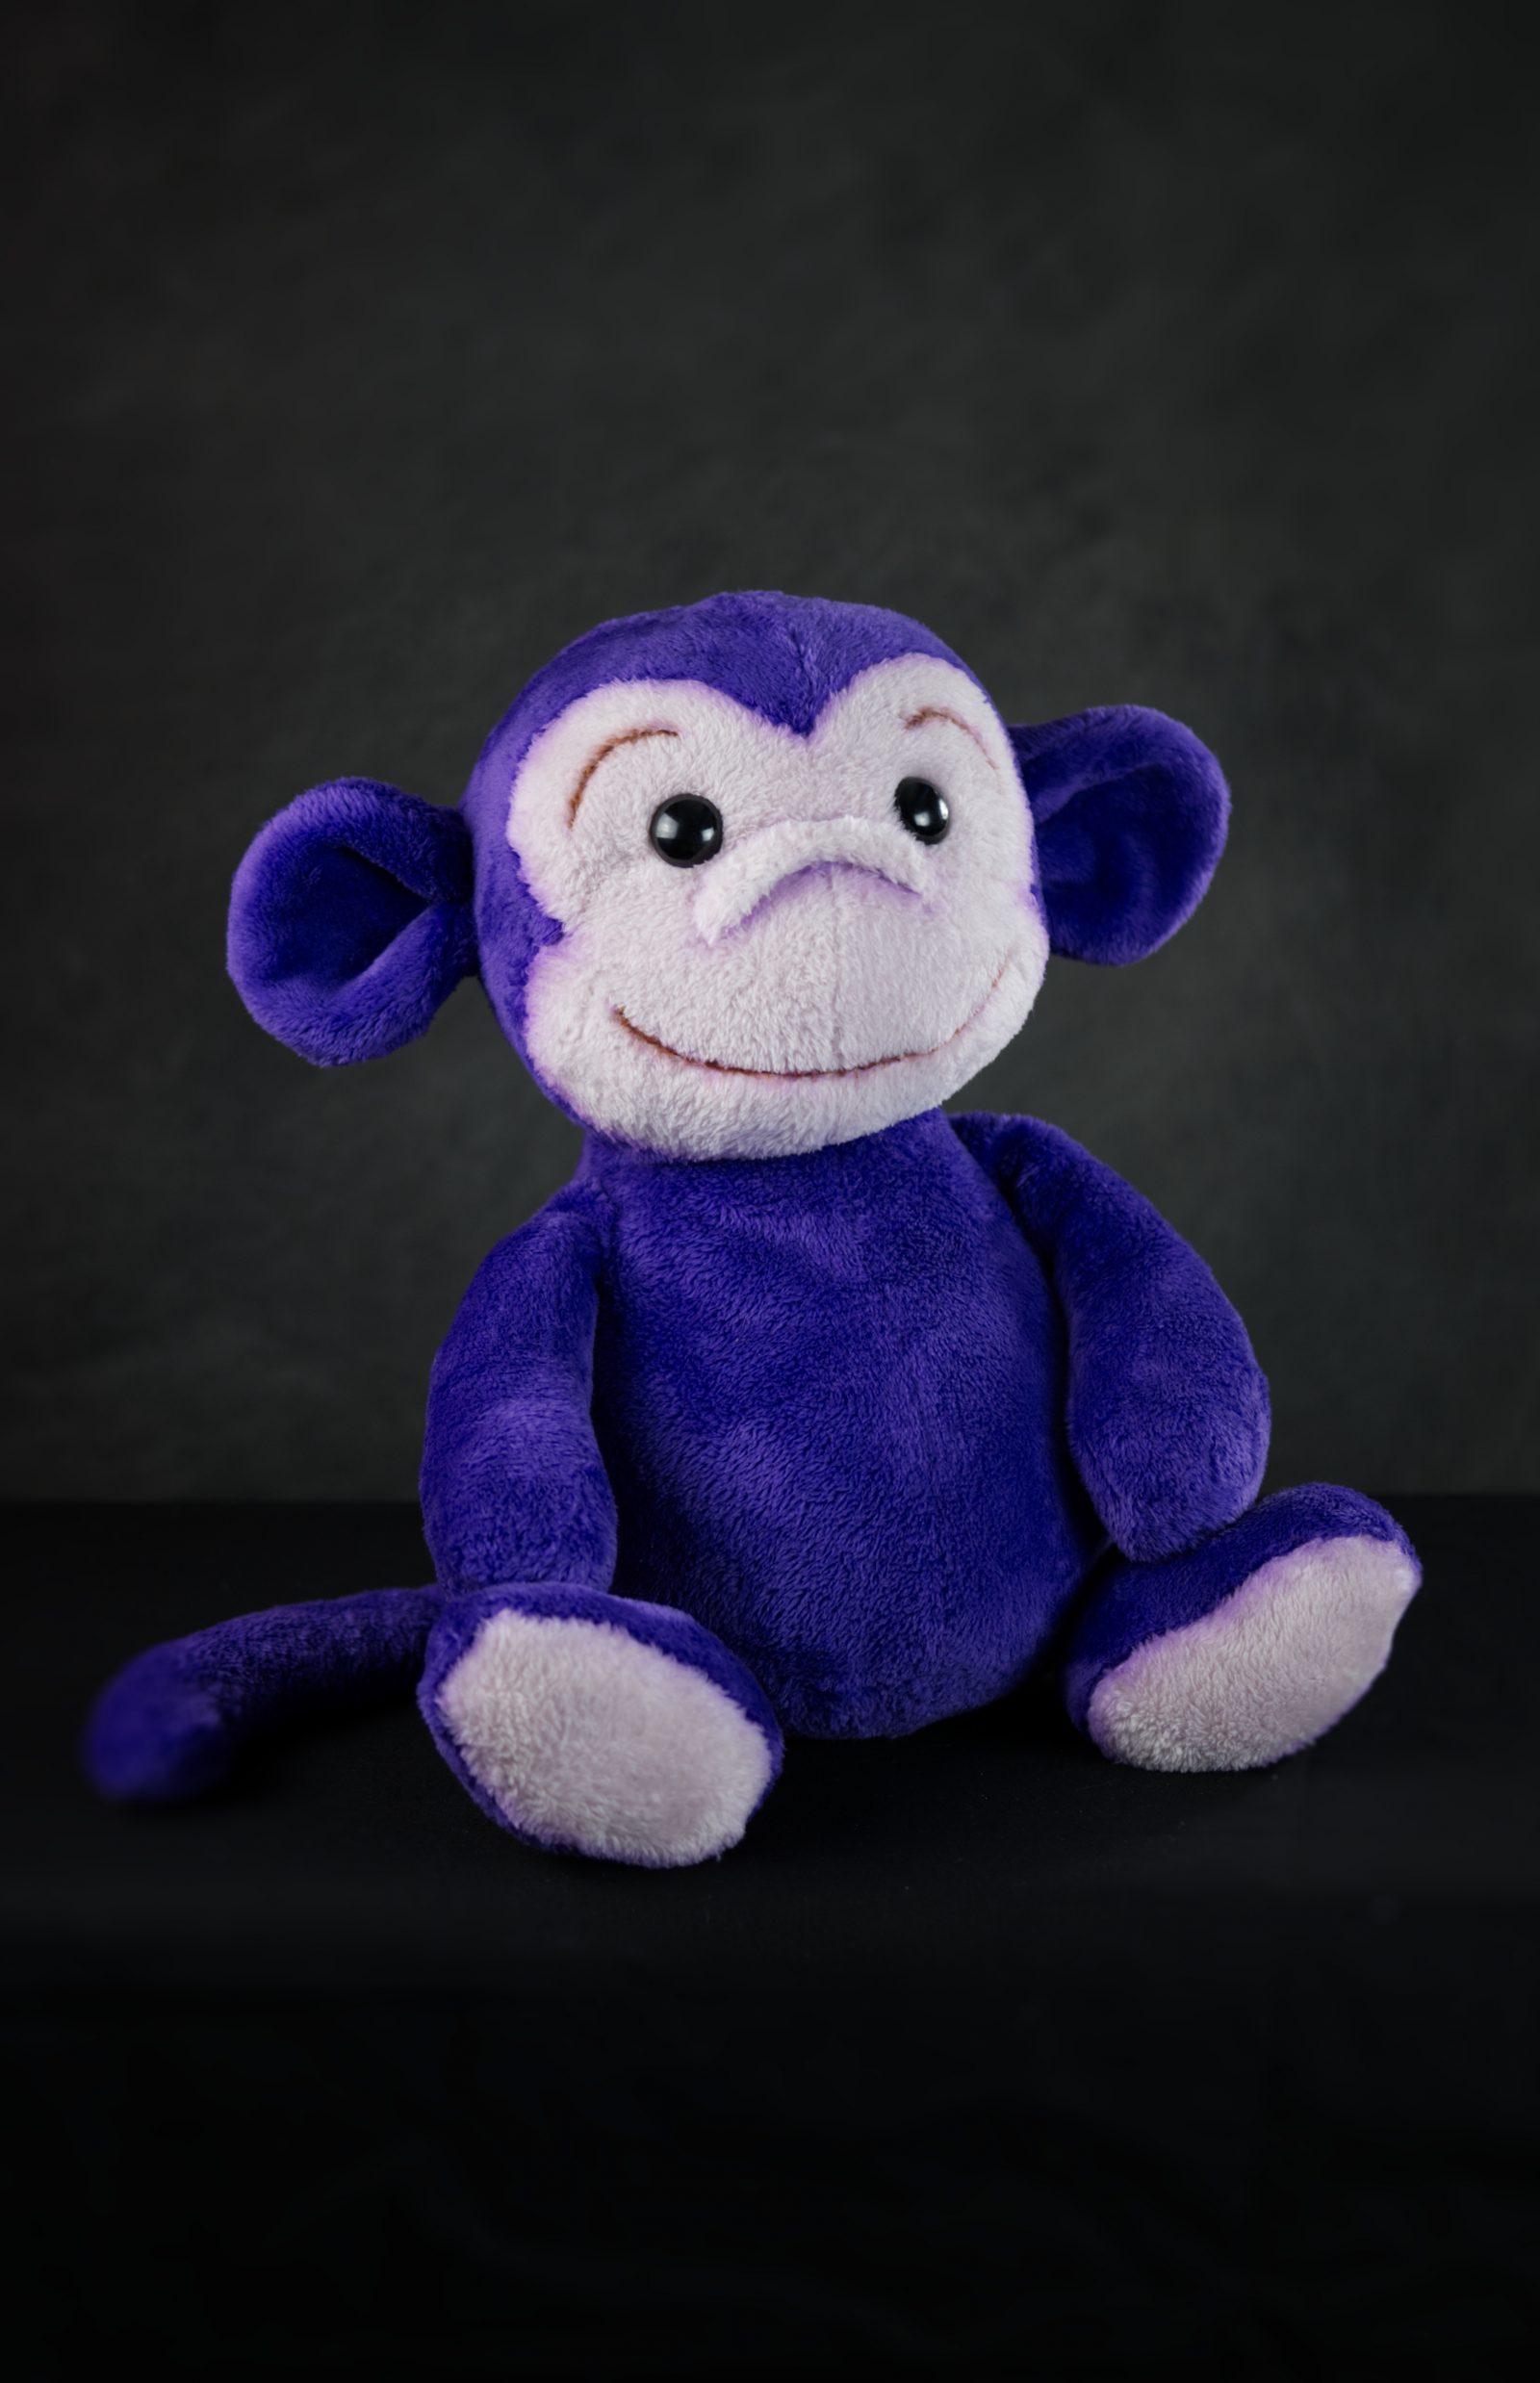 cheeky monsters monkey plush